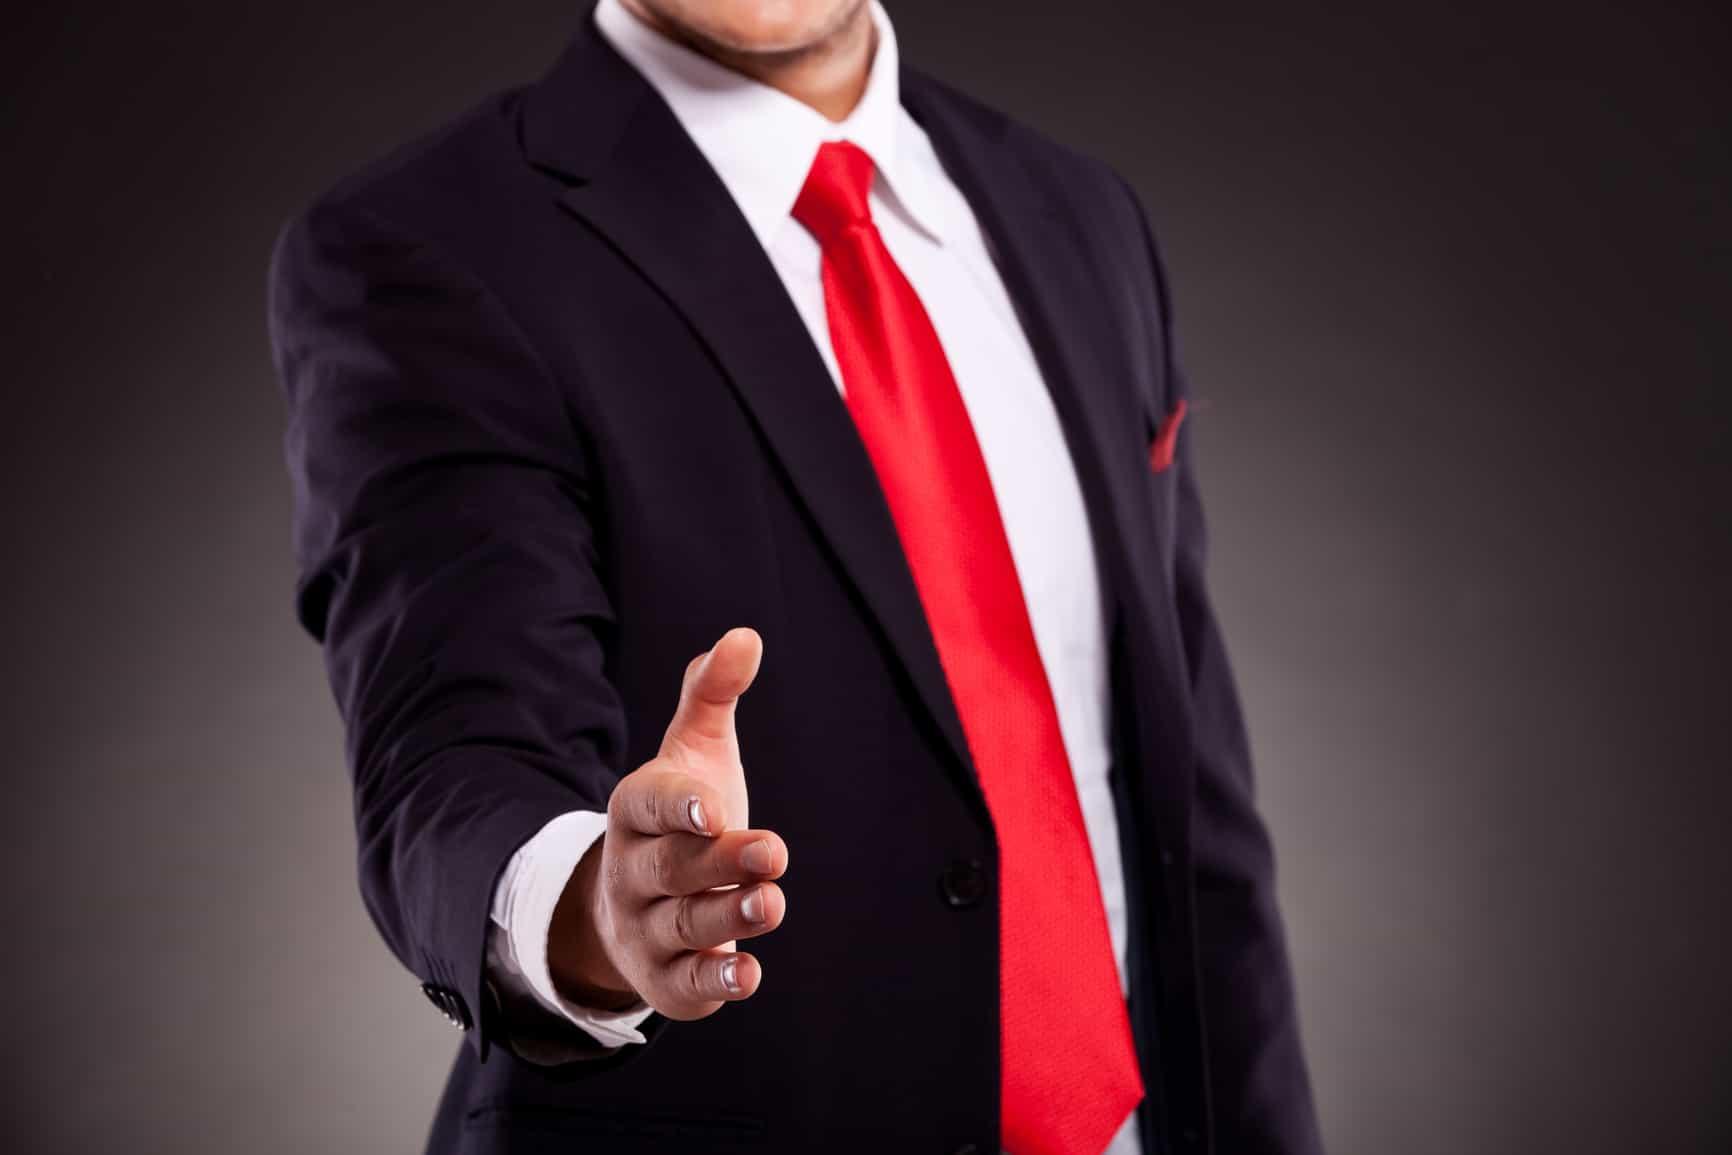 hiring new salesperson